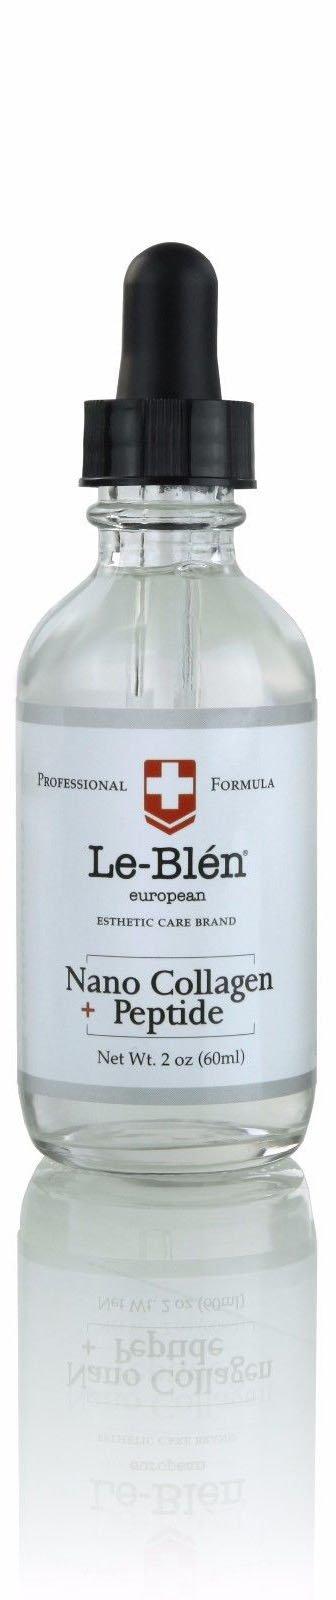 Le-Blen european ESTHETIC CARE BRAND - Nano Collagen Peptide (2oz)